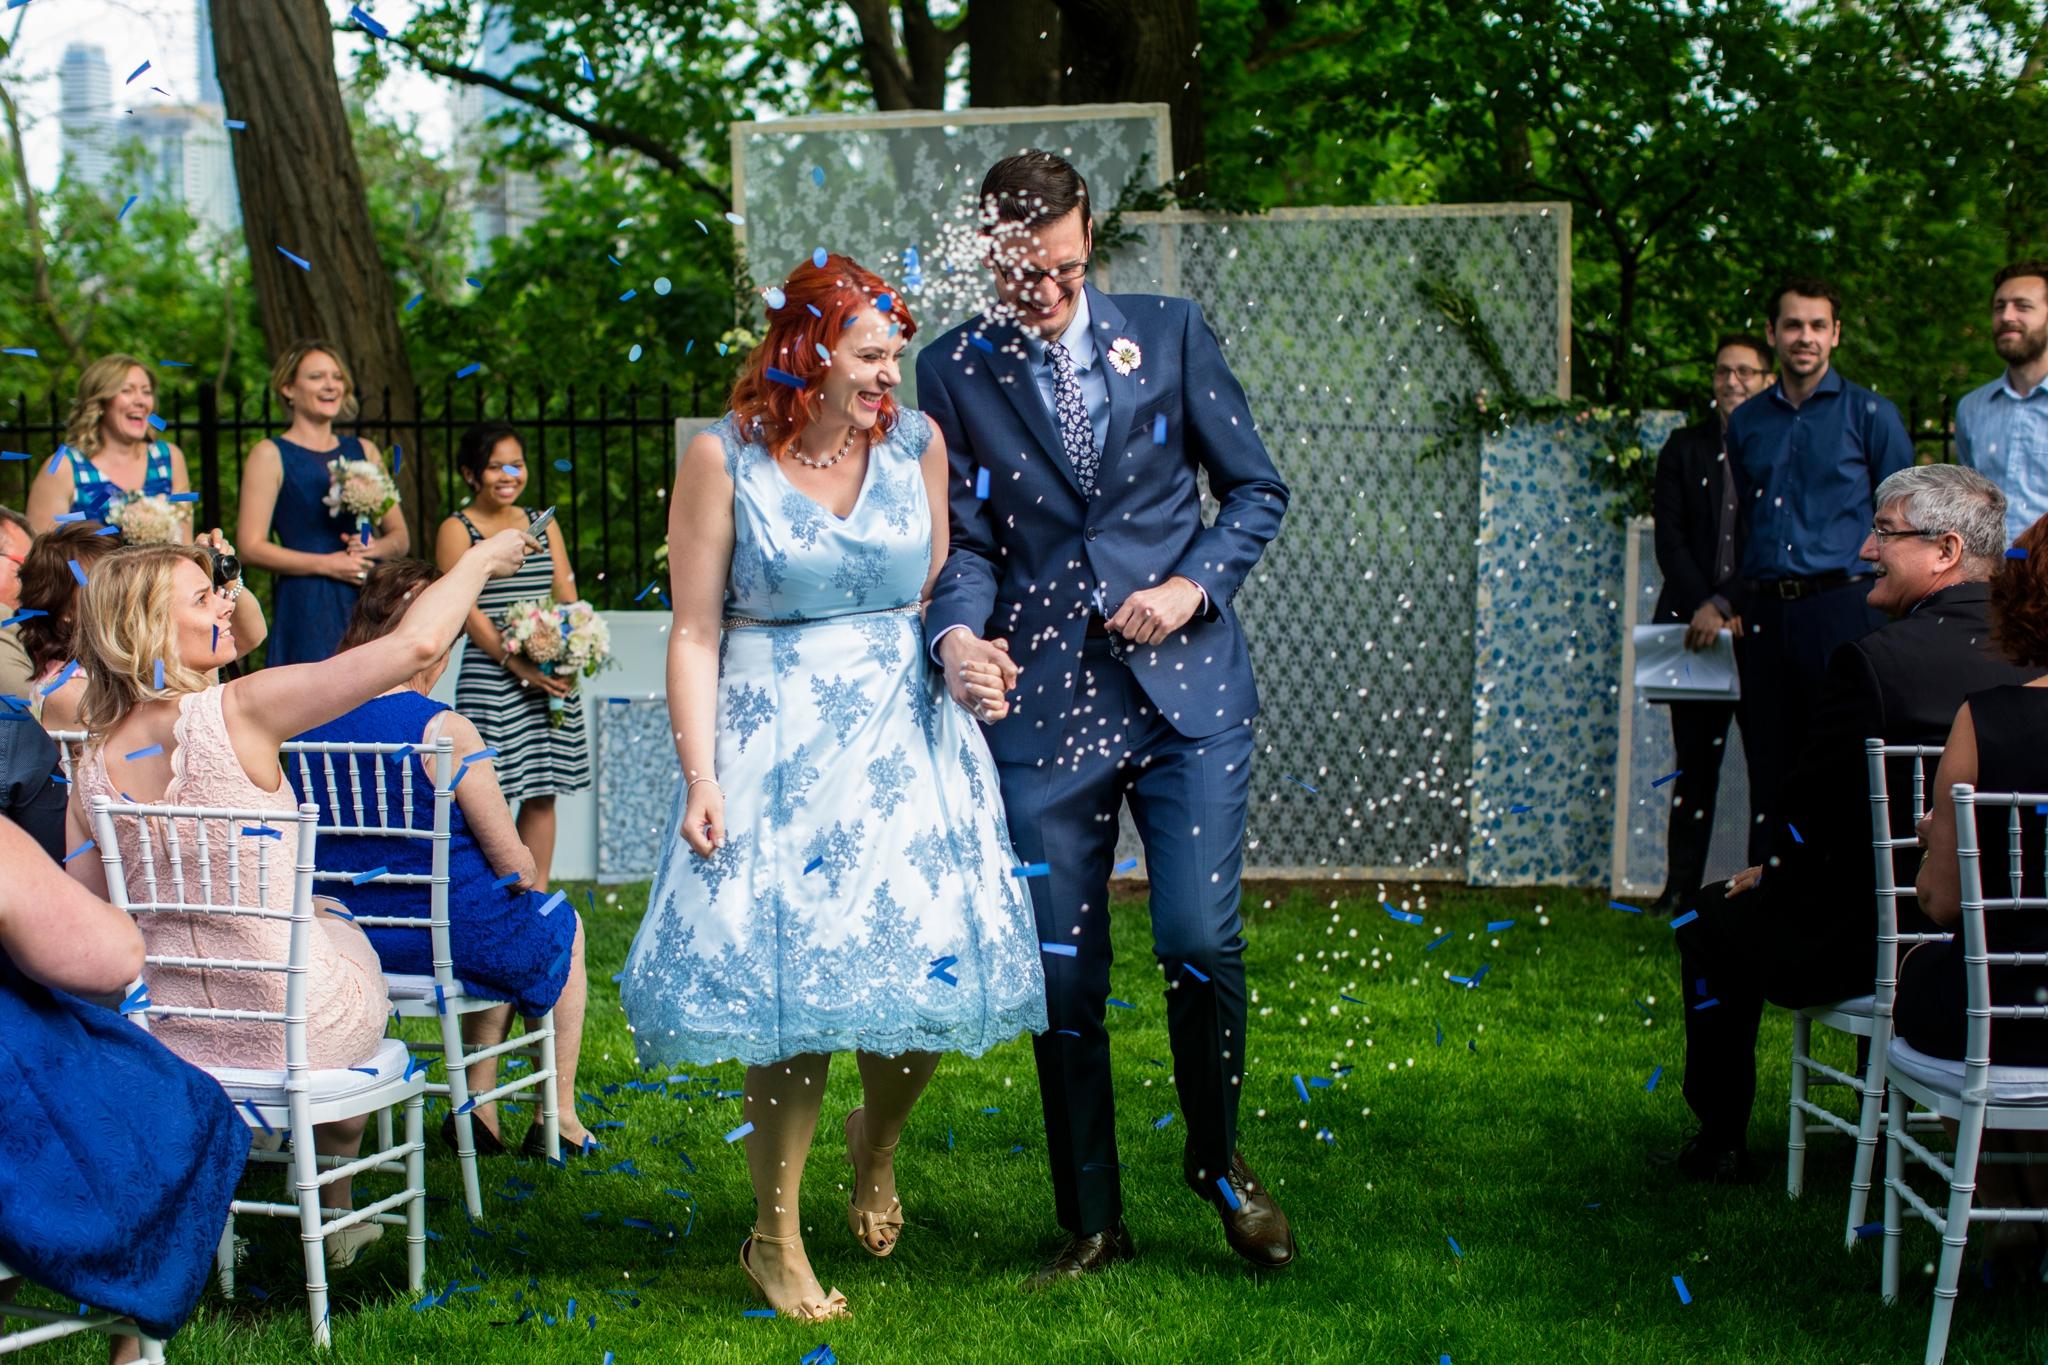 edmonton calgary alberta wedding photographer76.jpg